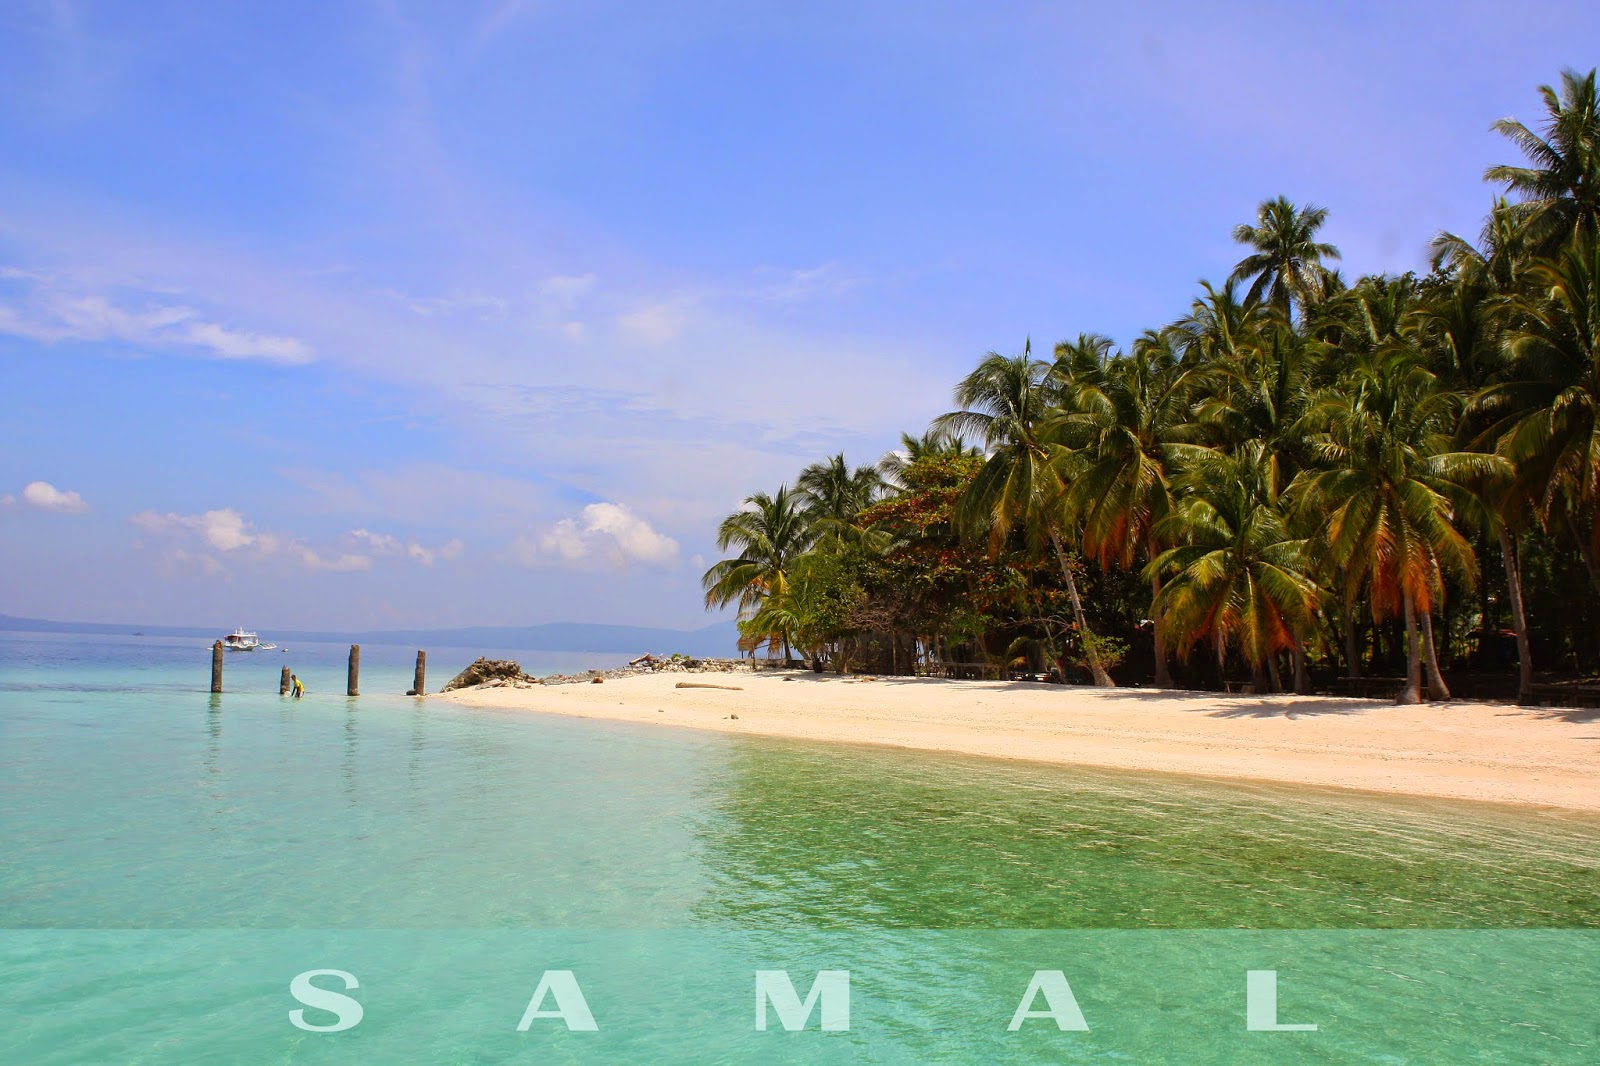 Samal Beaches Room Rates